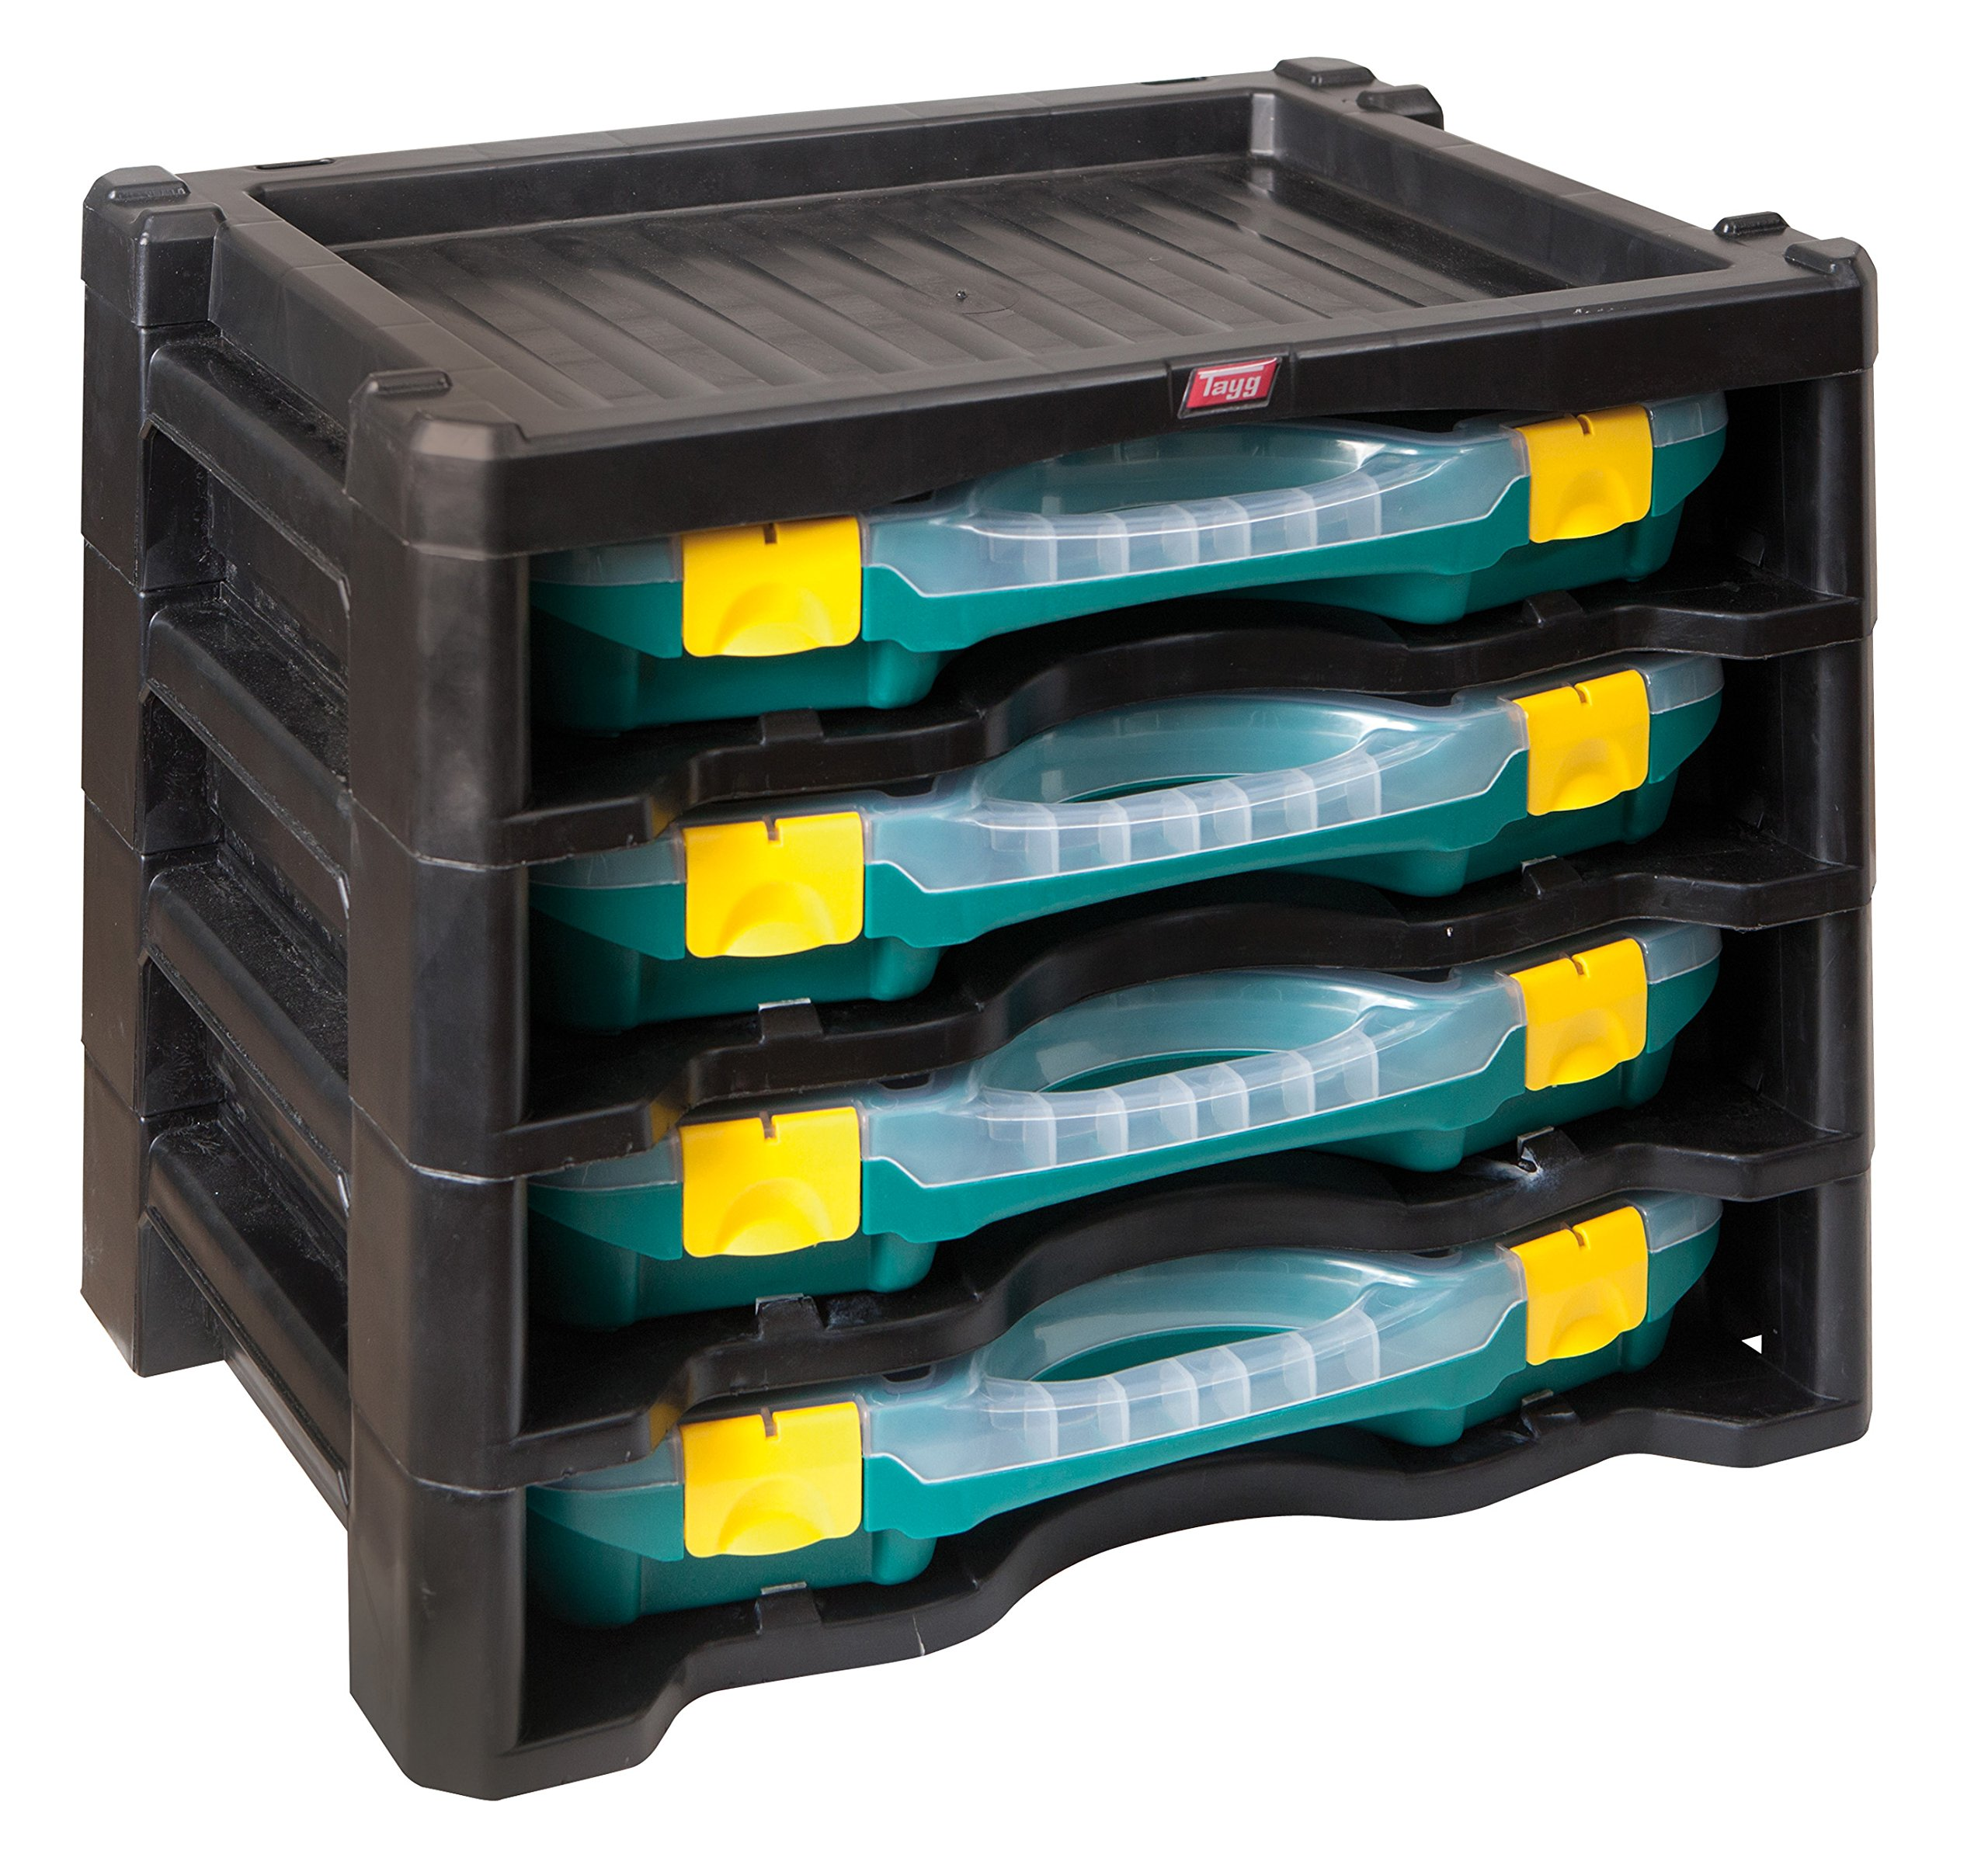 TAYG 302008 Multi-Box Empilable nº 2, Vert